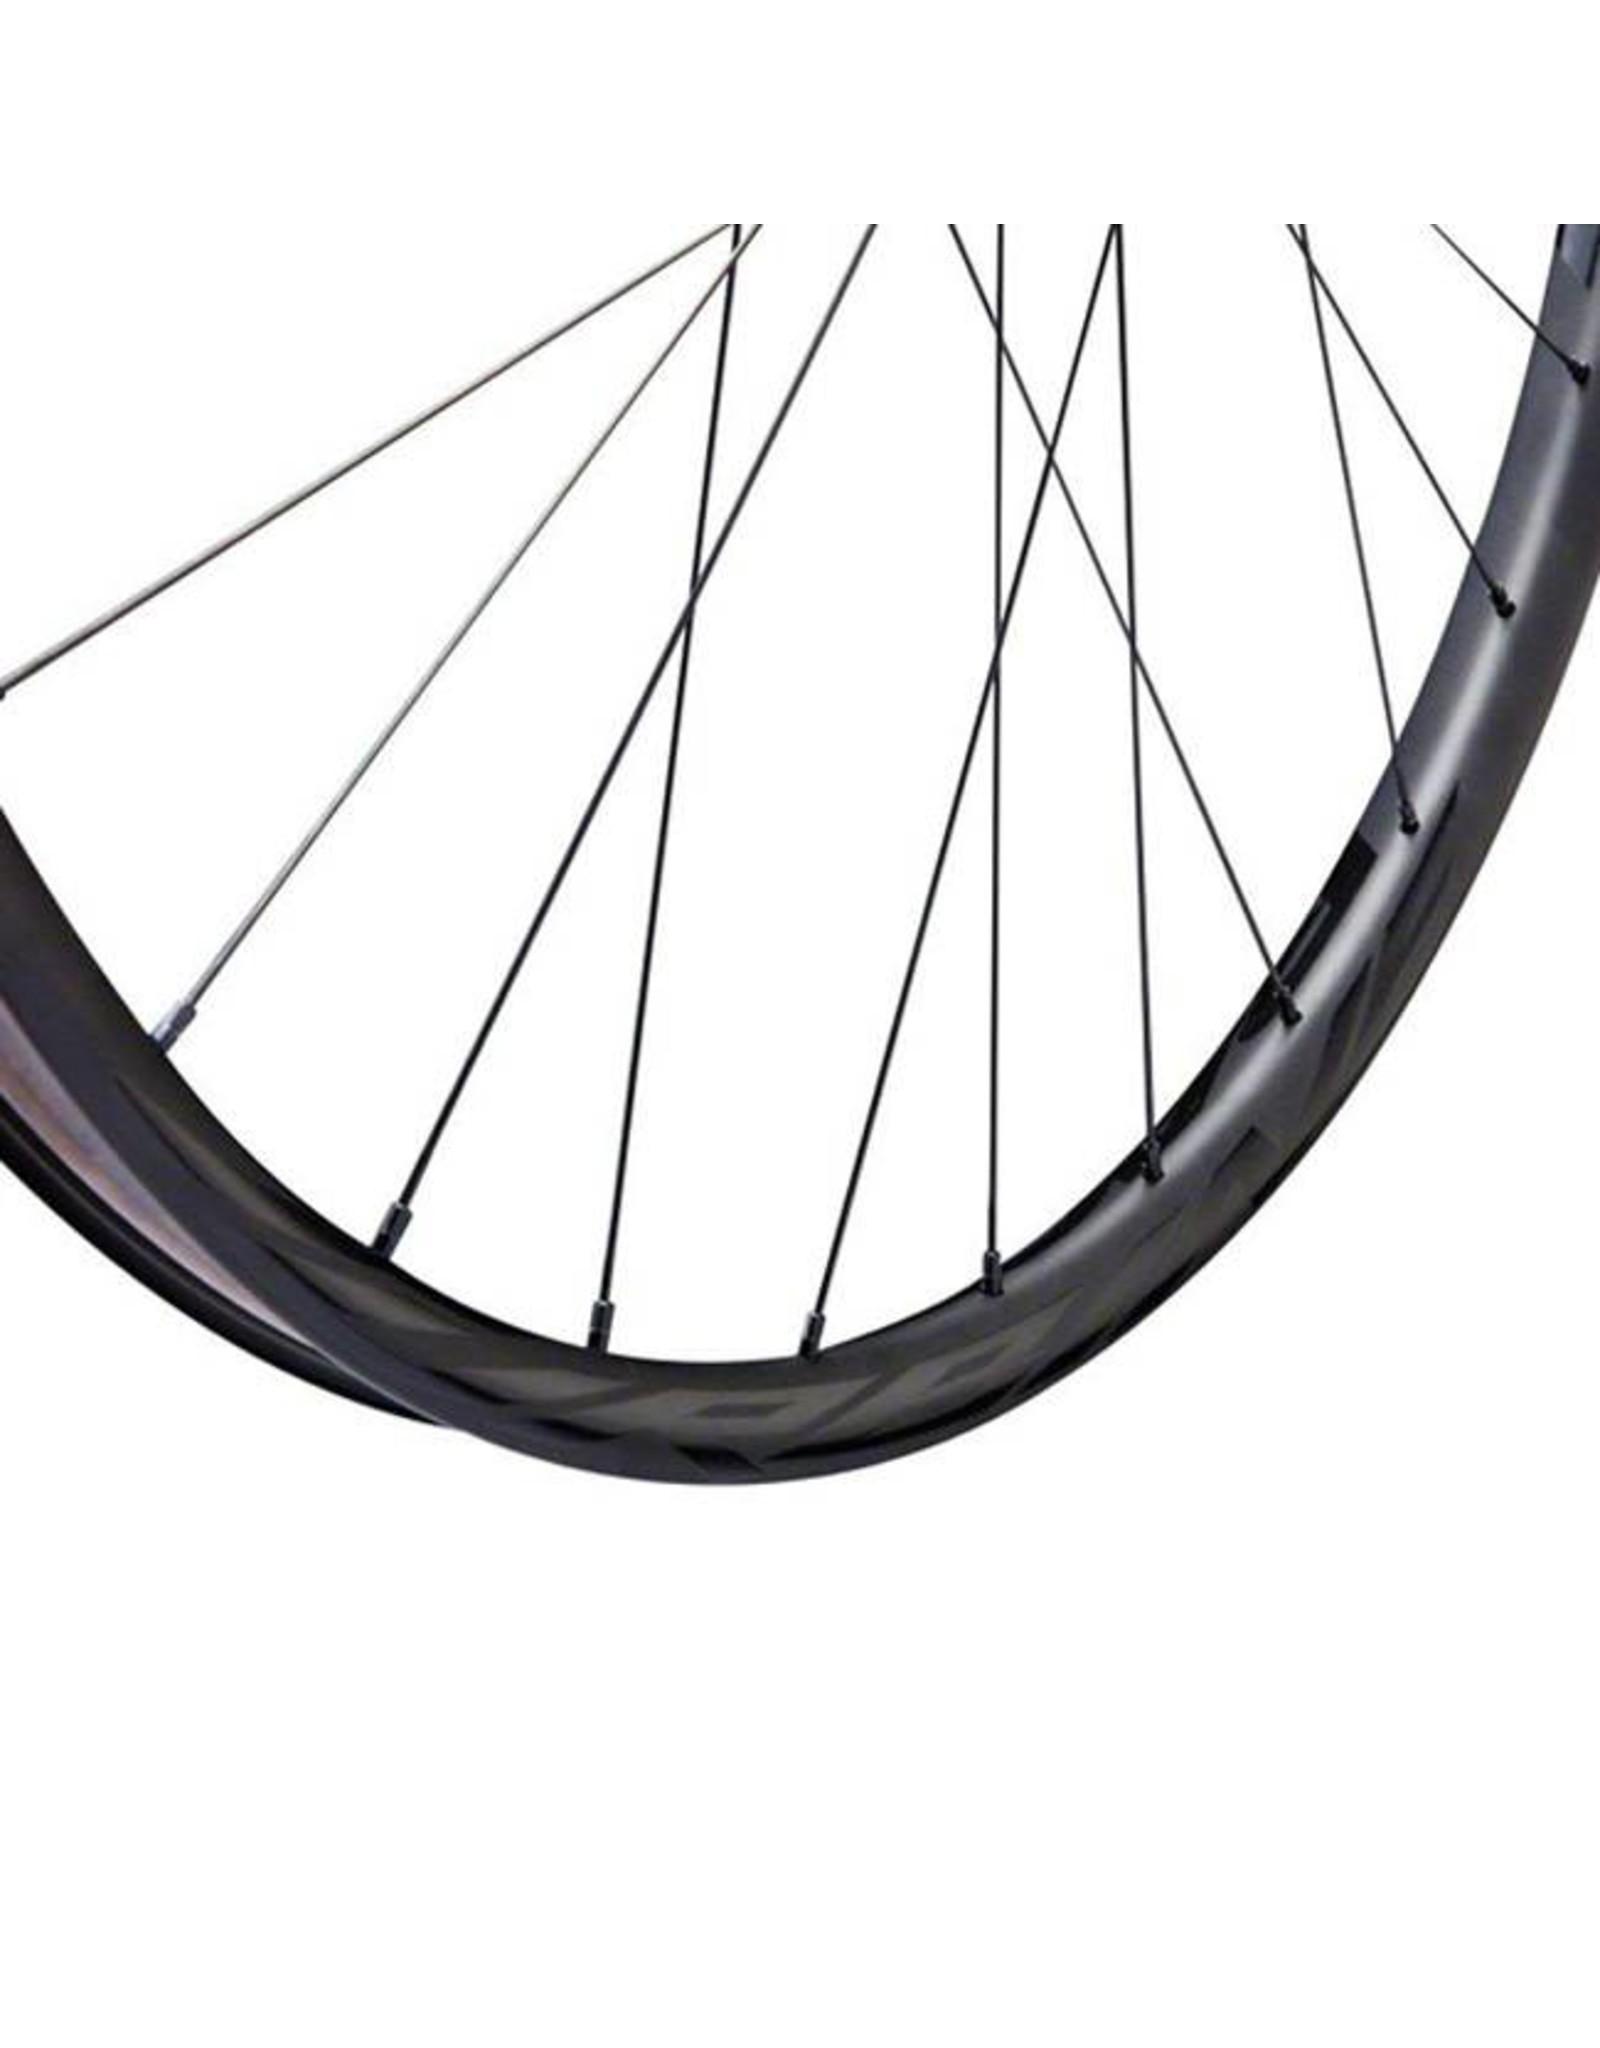 "RaceFace RaceFace Turbine R Rear Wheel: 29"", Alloy Rim, 12 x 148mm Thru Axle, Shimano Freehub"